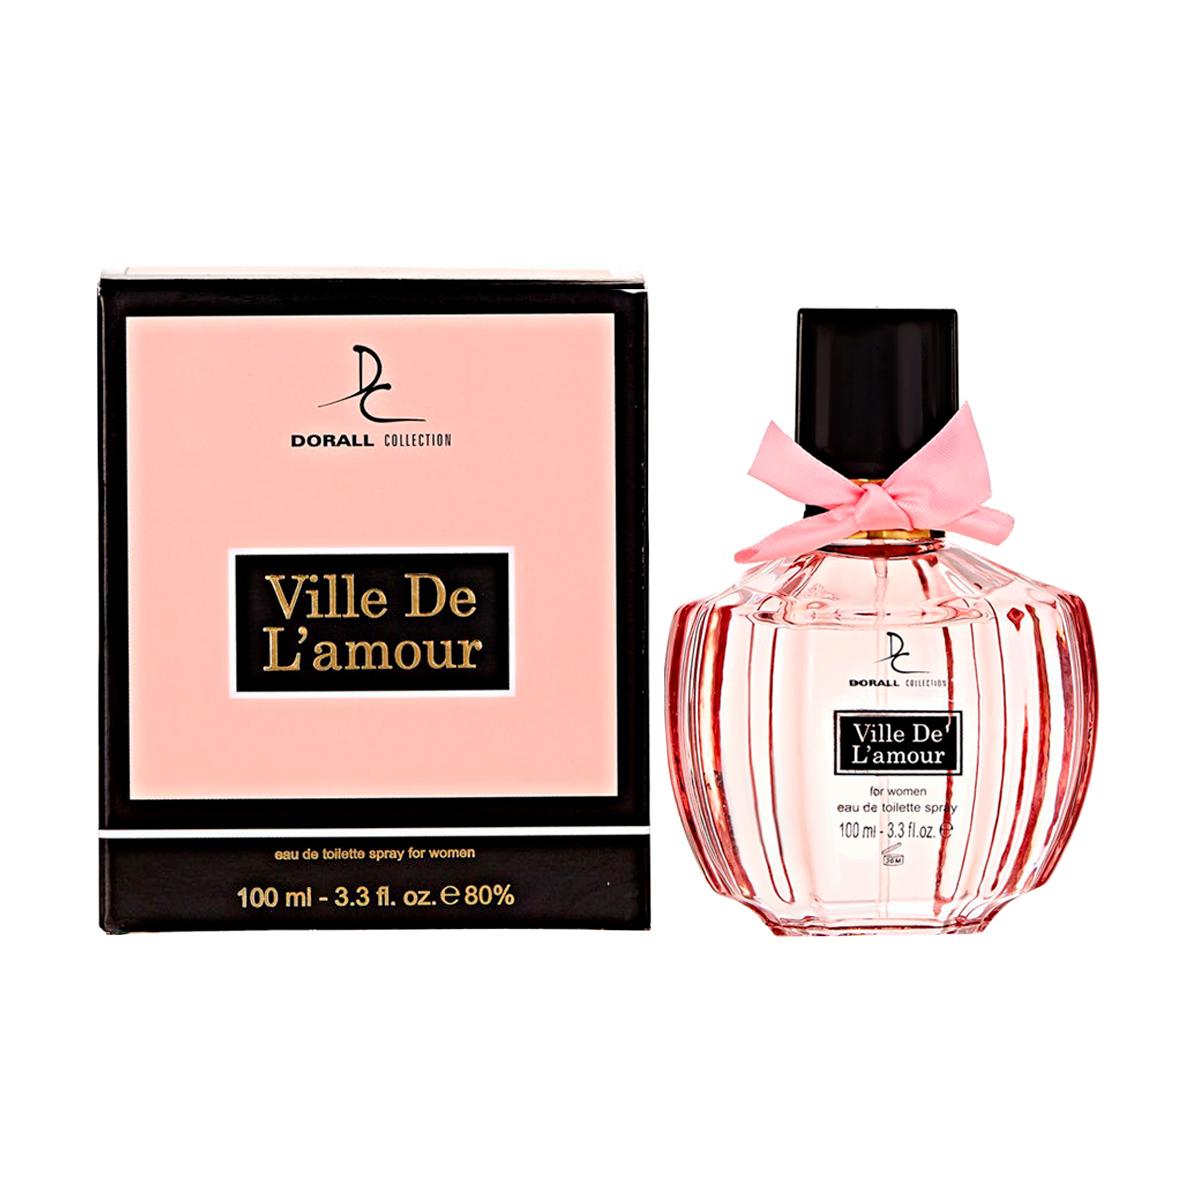 "Dorall Collection Ville De LAmour парфюмированная вода женская"""